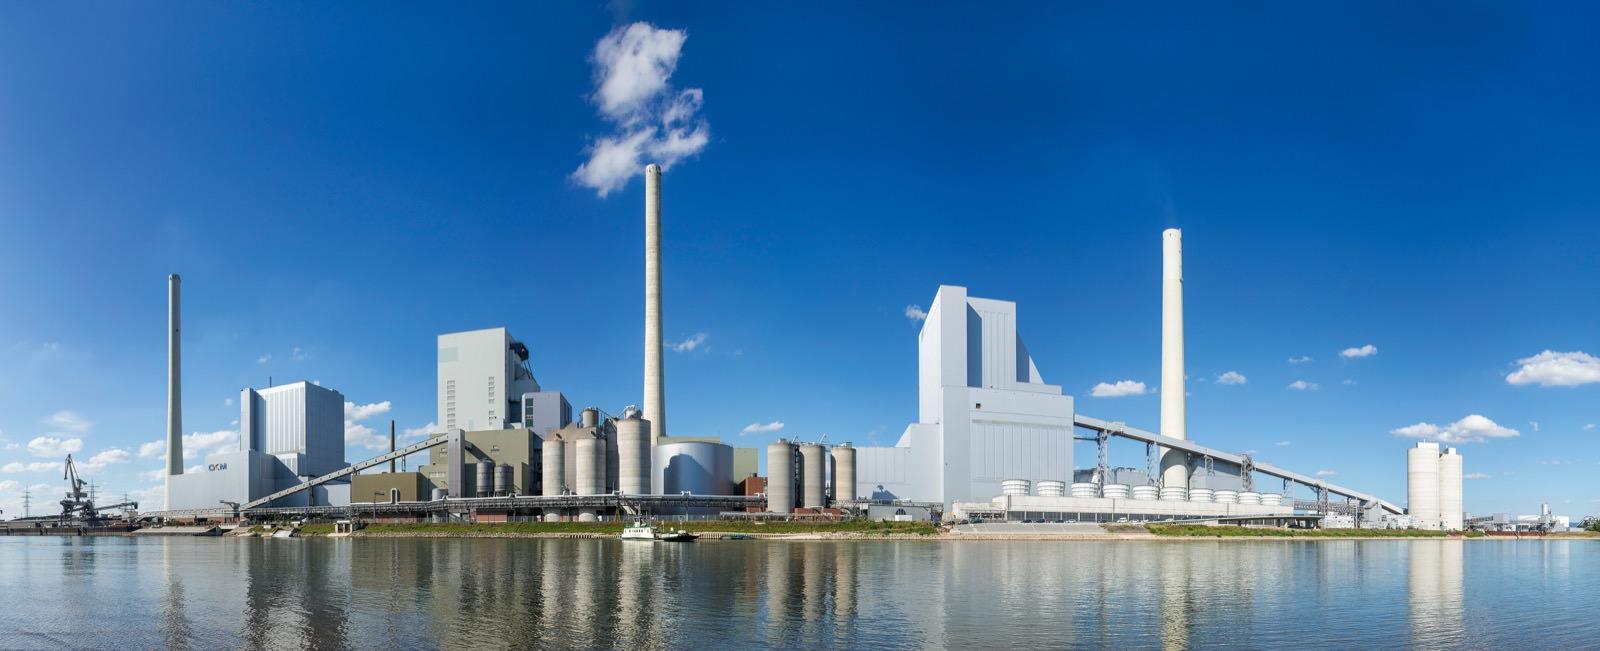 Großkraftwerk Mannheim | Foto: MVV-Pressebild